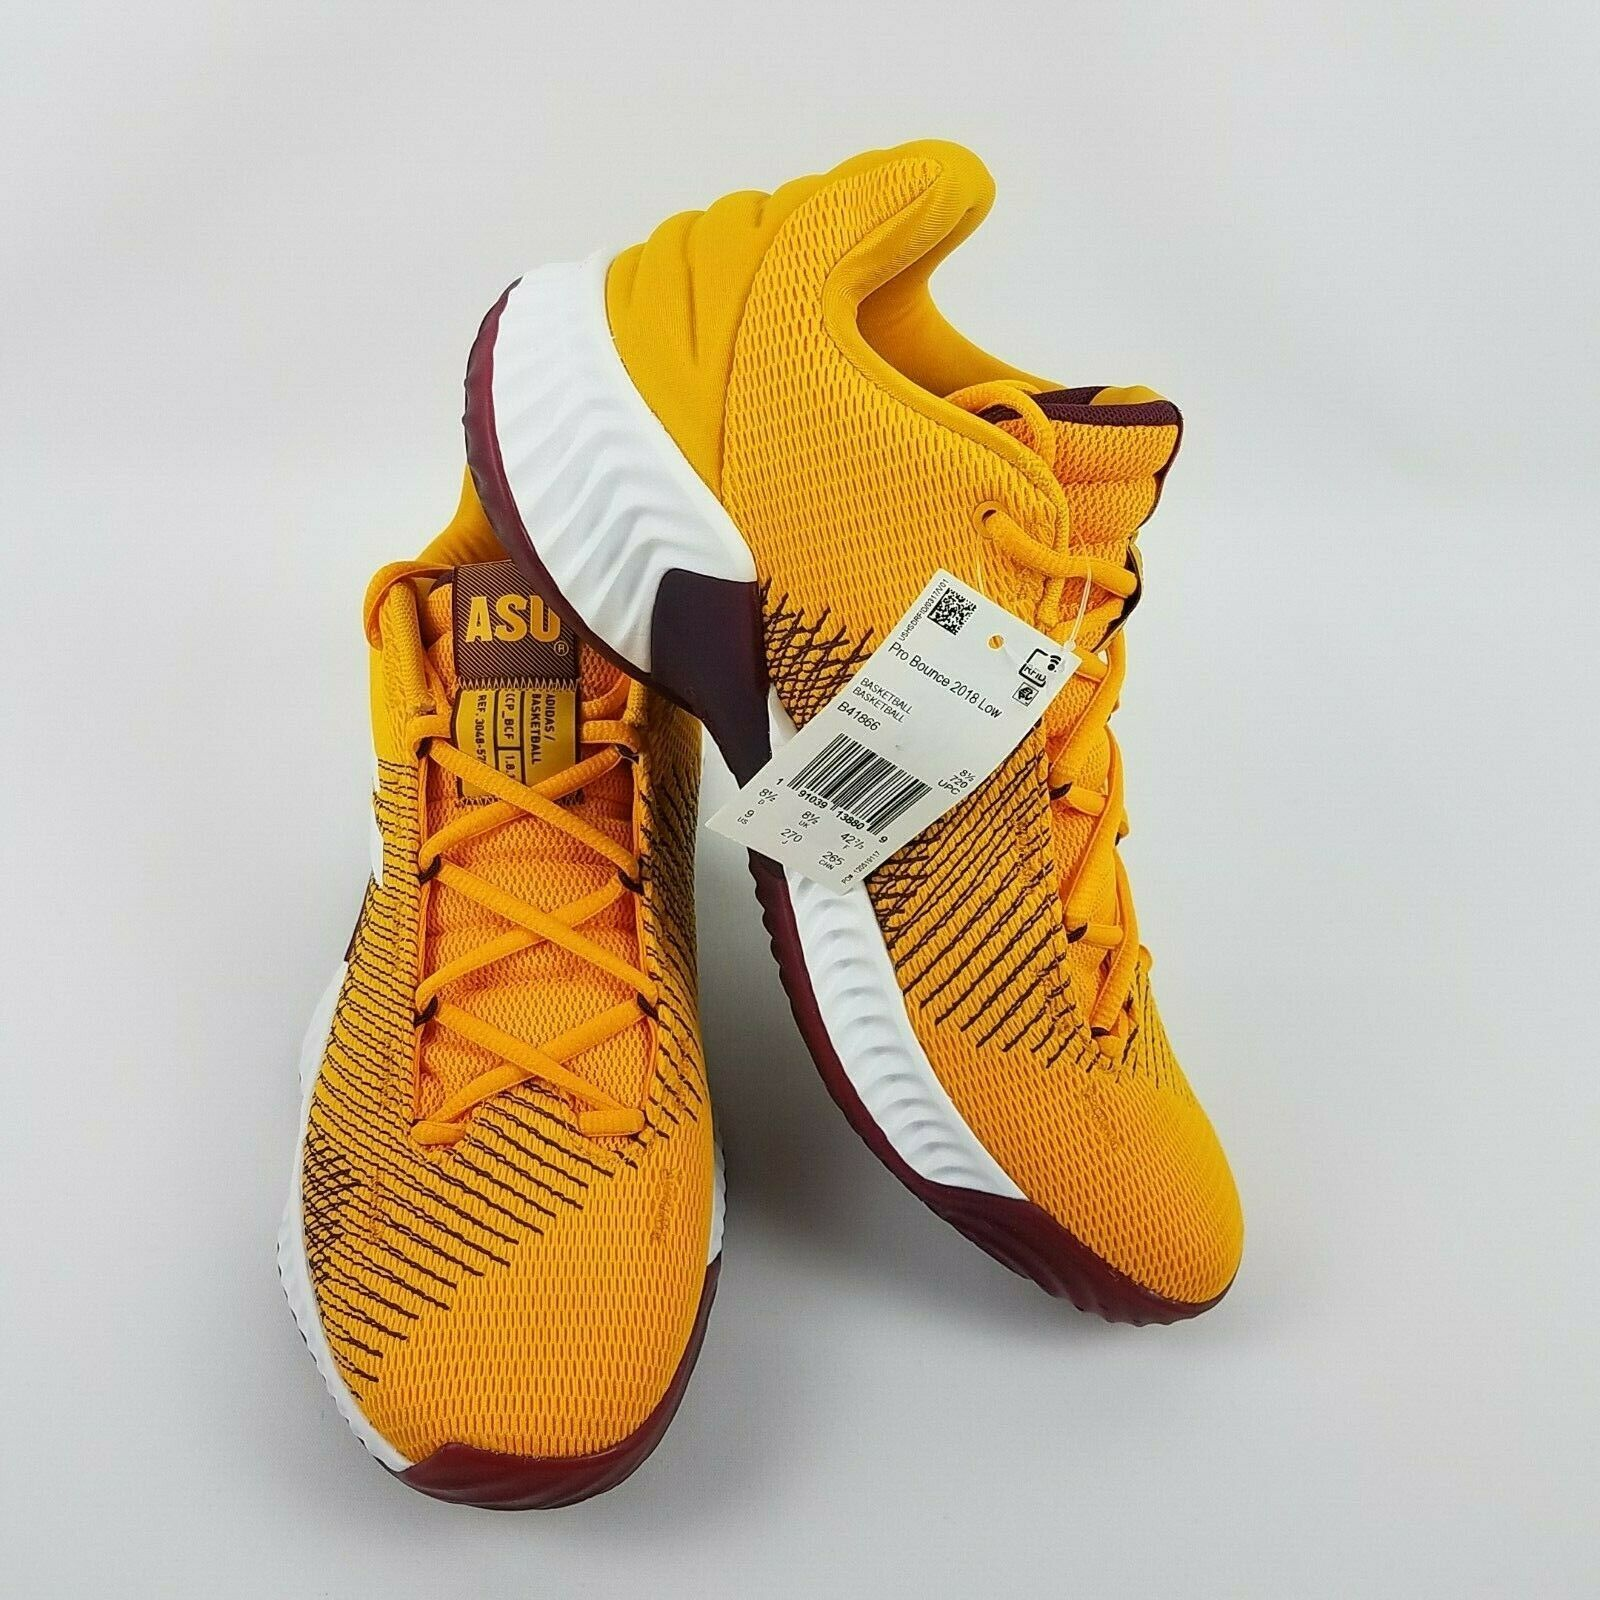 adidas Mens Pro Bounce 2018 Low ASU Basketball Shoe NCAA B41866 Size 9 image 2